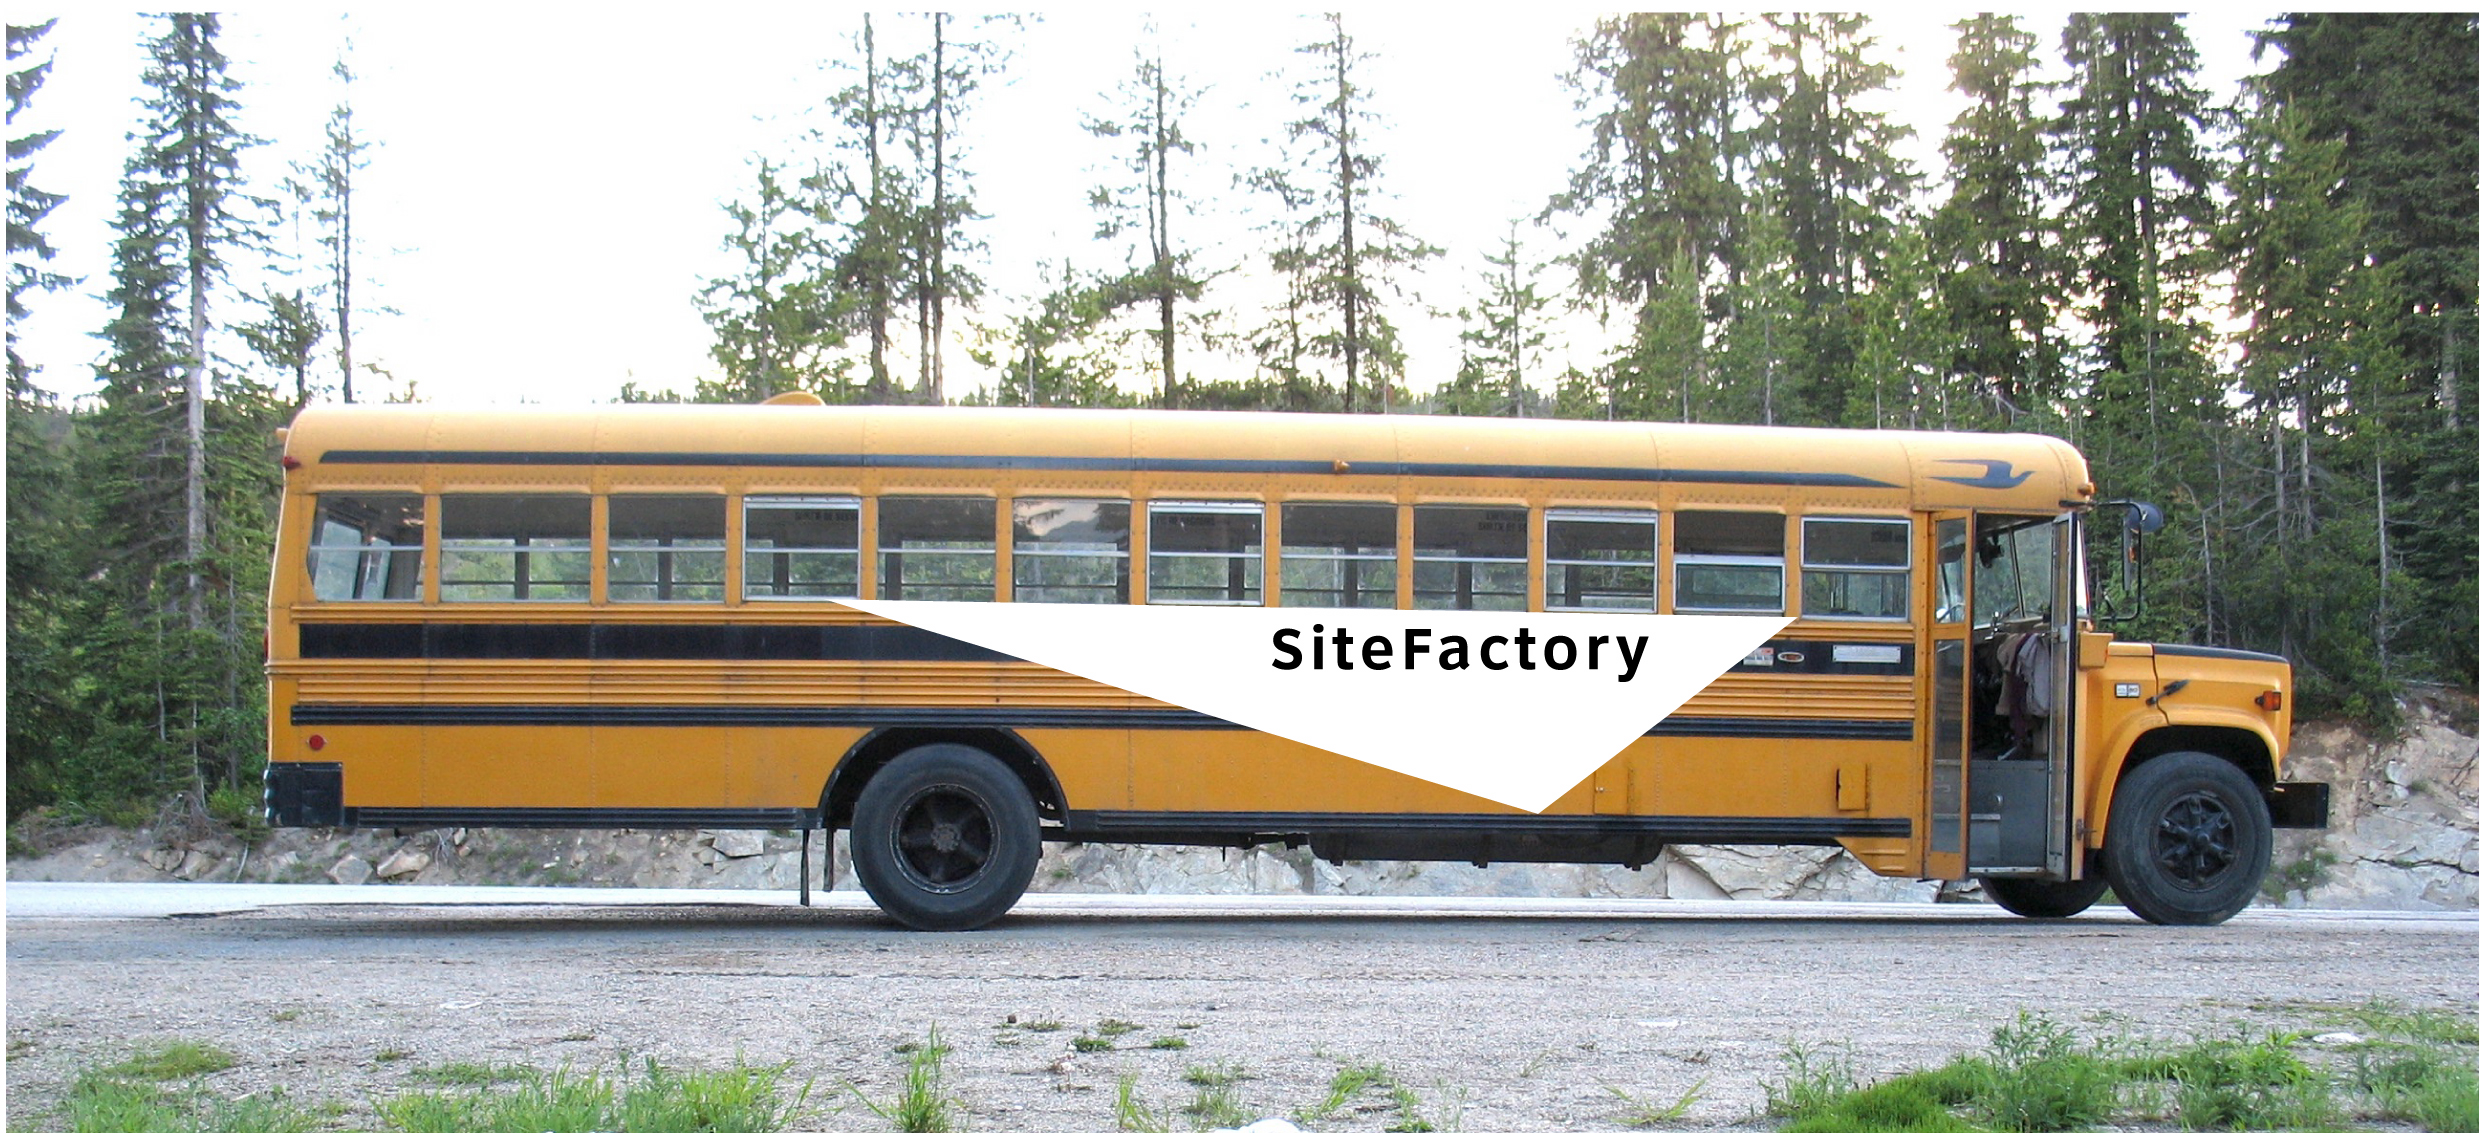 SiteFactory Mobile Art Platform